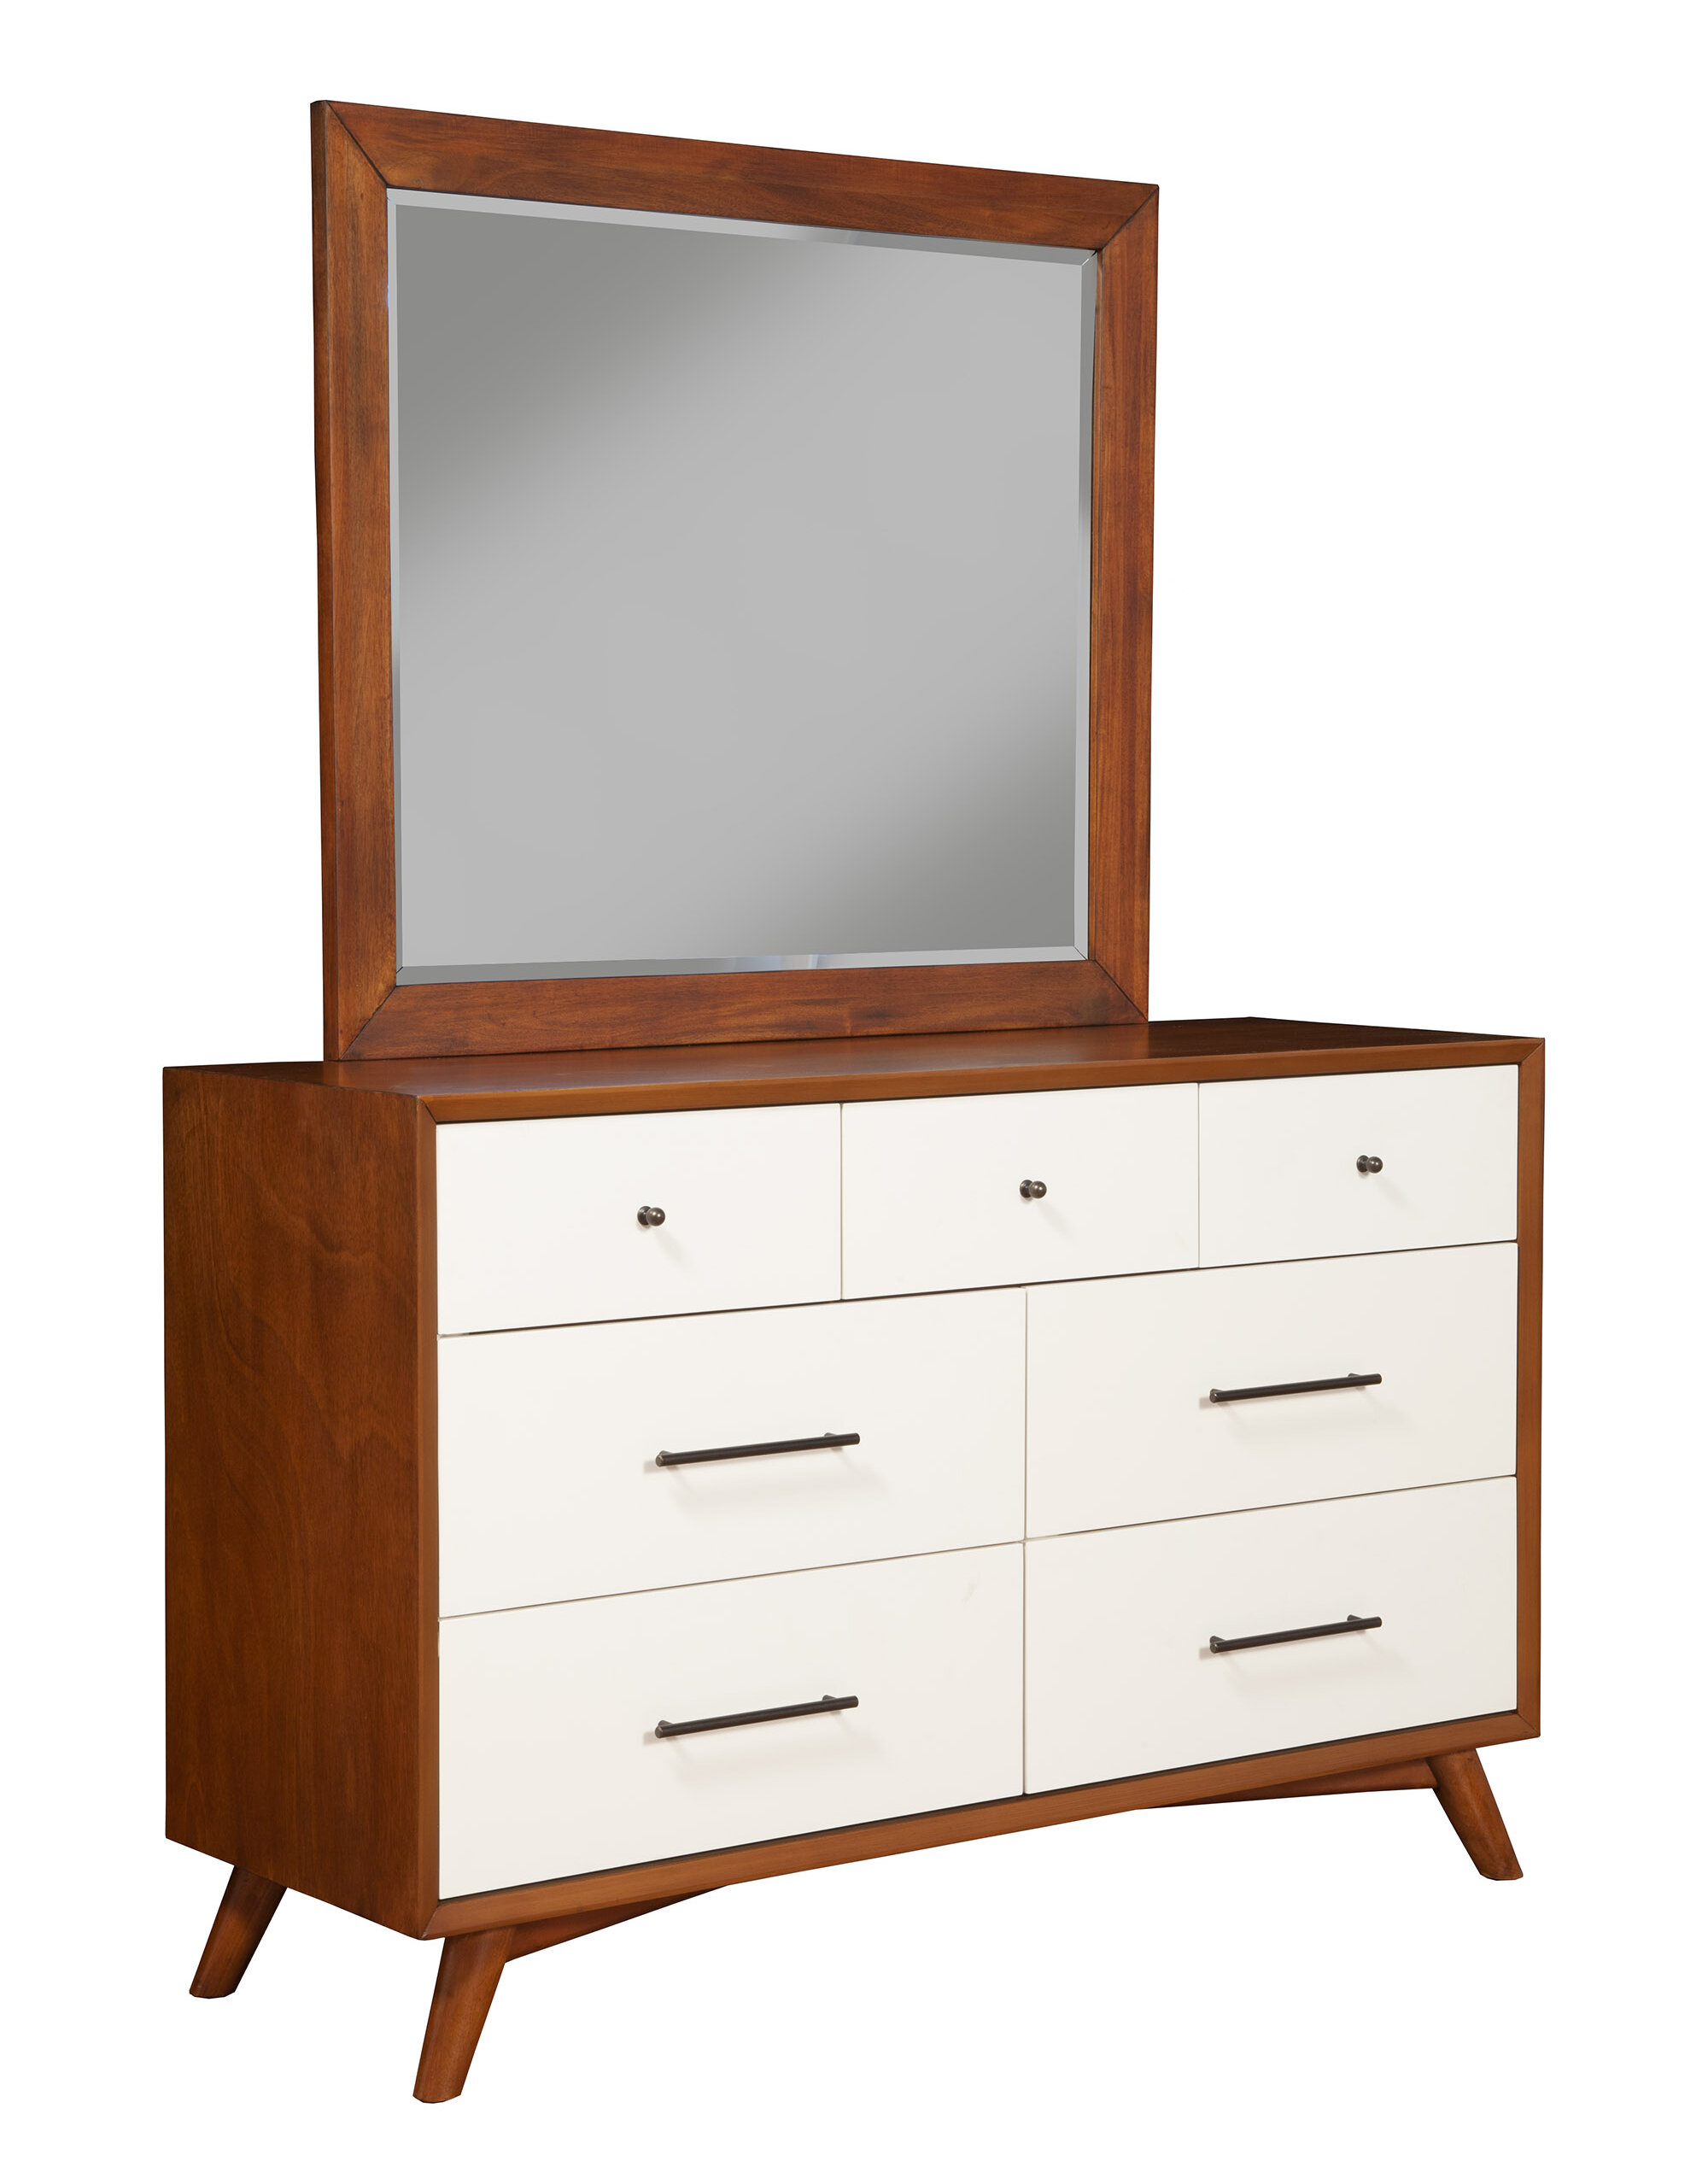 Parocela Mid Century Modern Dresser Mirror Reviews Allmodern